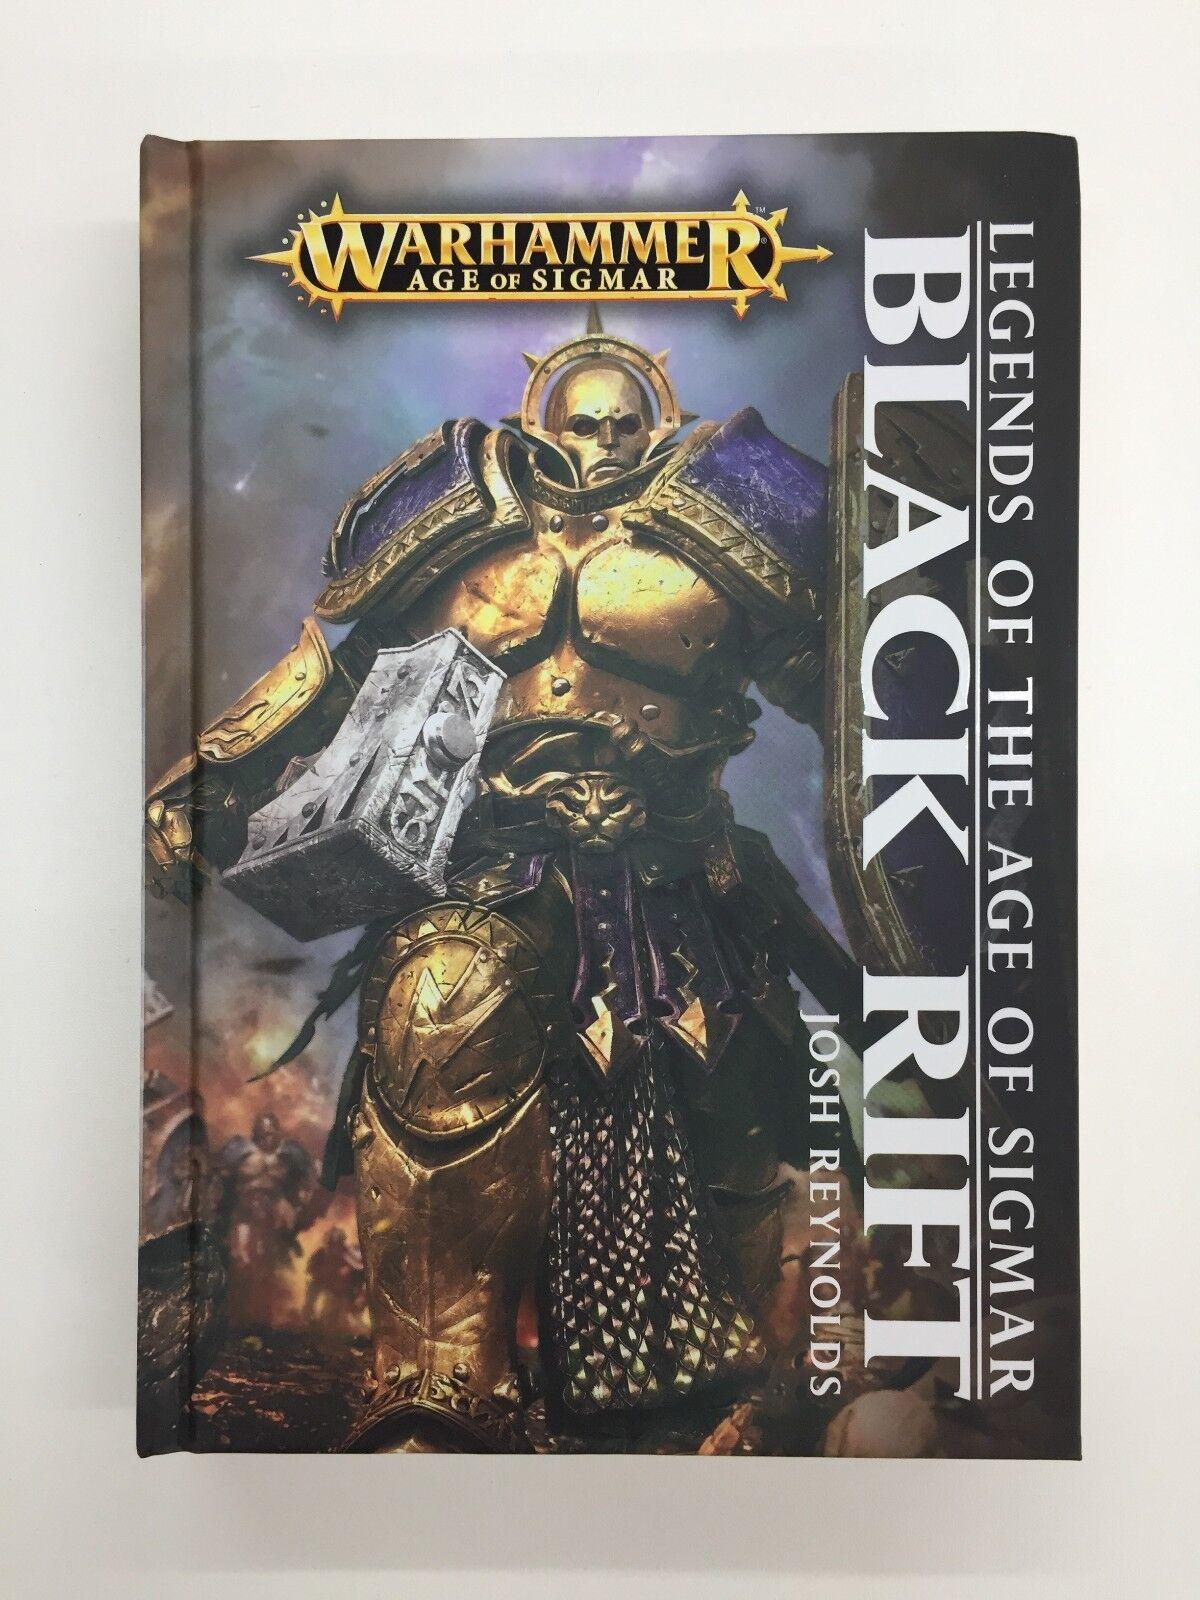 Leyendas de la edad de Sigmar Negro Rift Warhammer Novela Tapa Dura stormcast